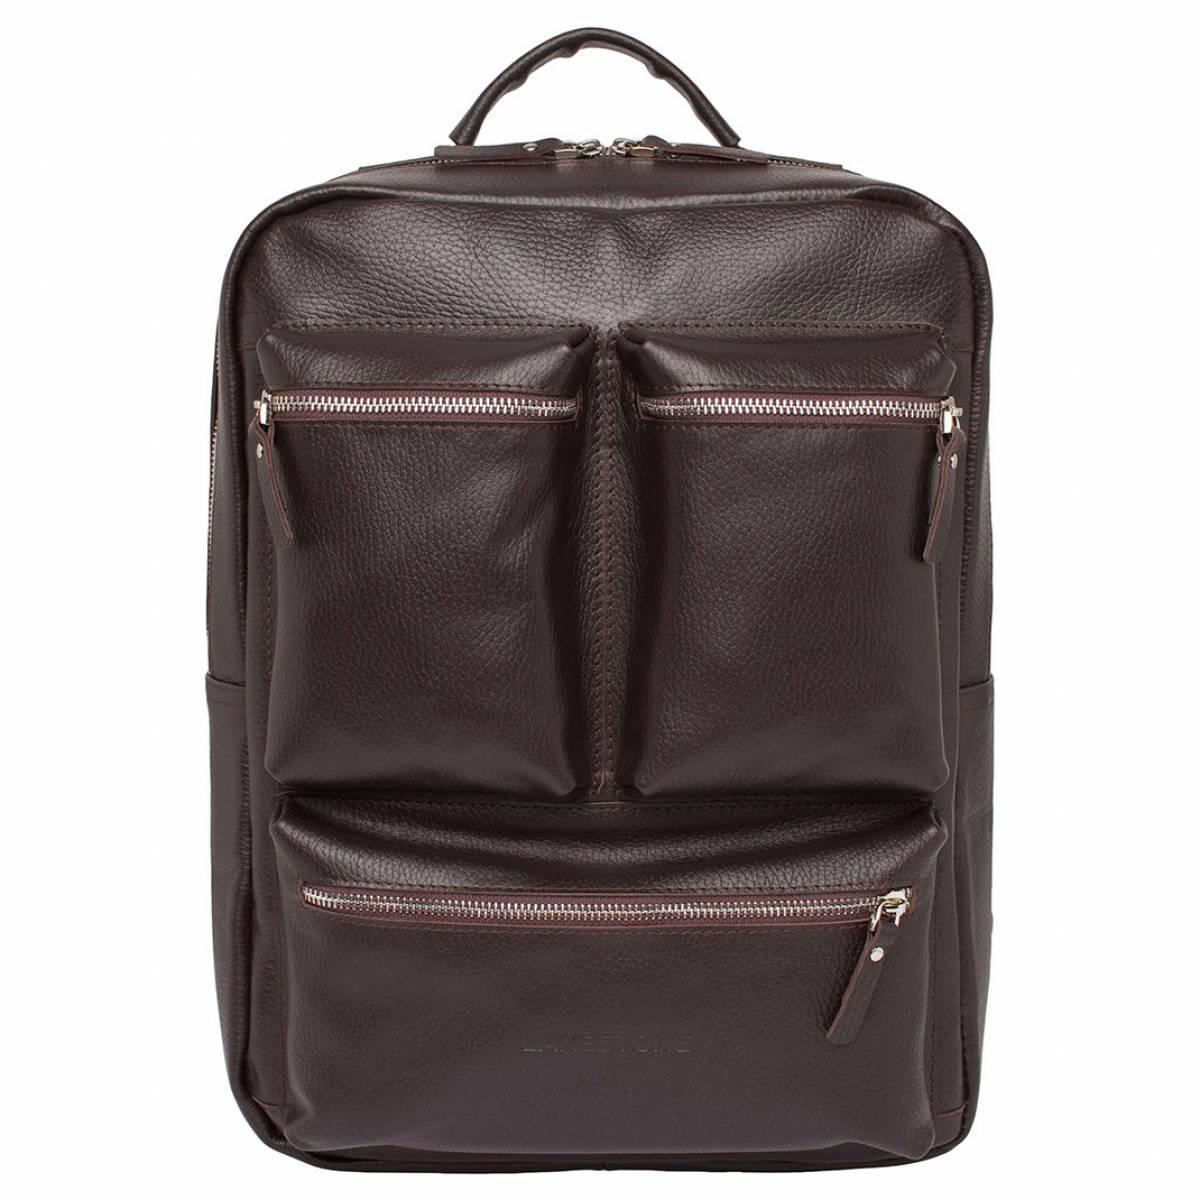 Рюкзак для ноутбука Norley Brown фото